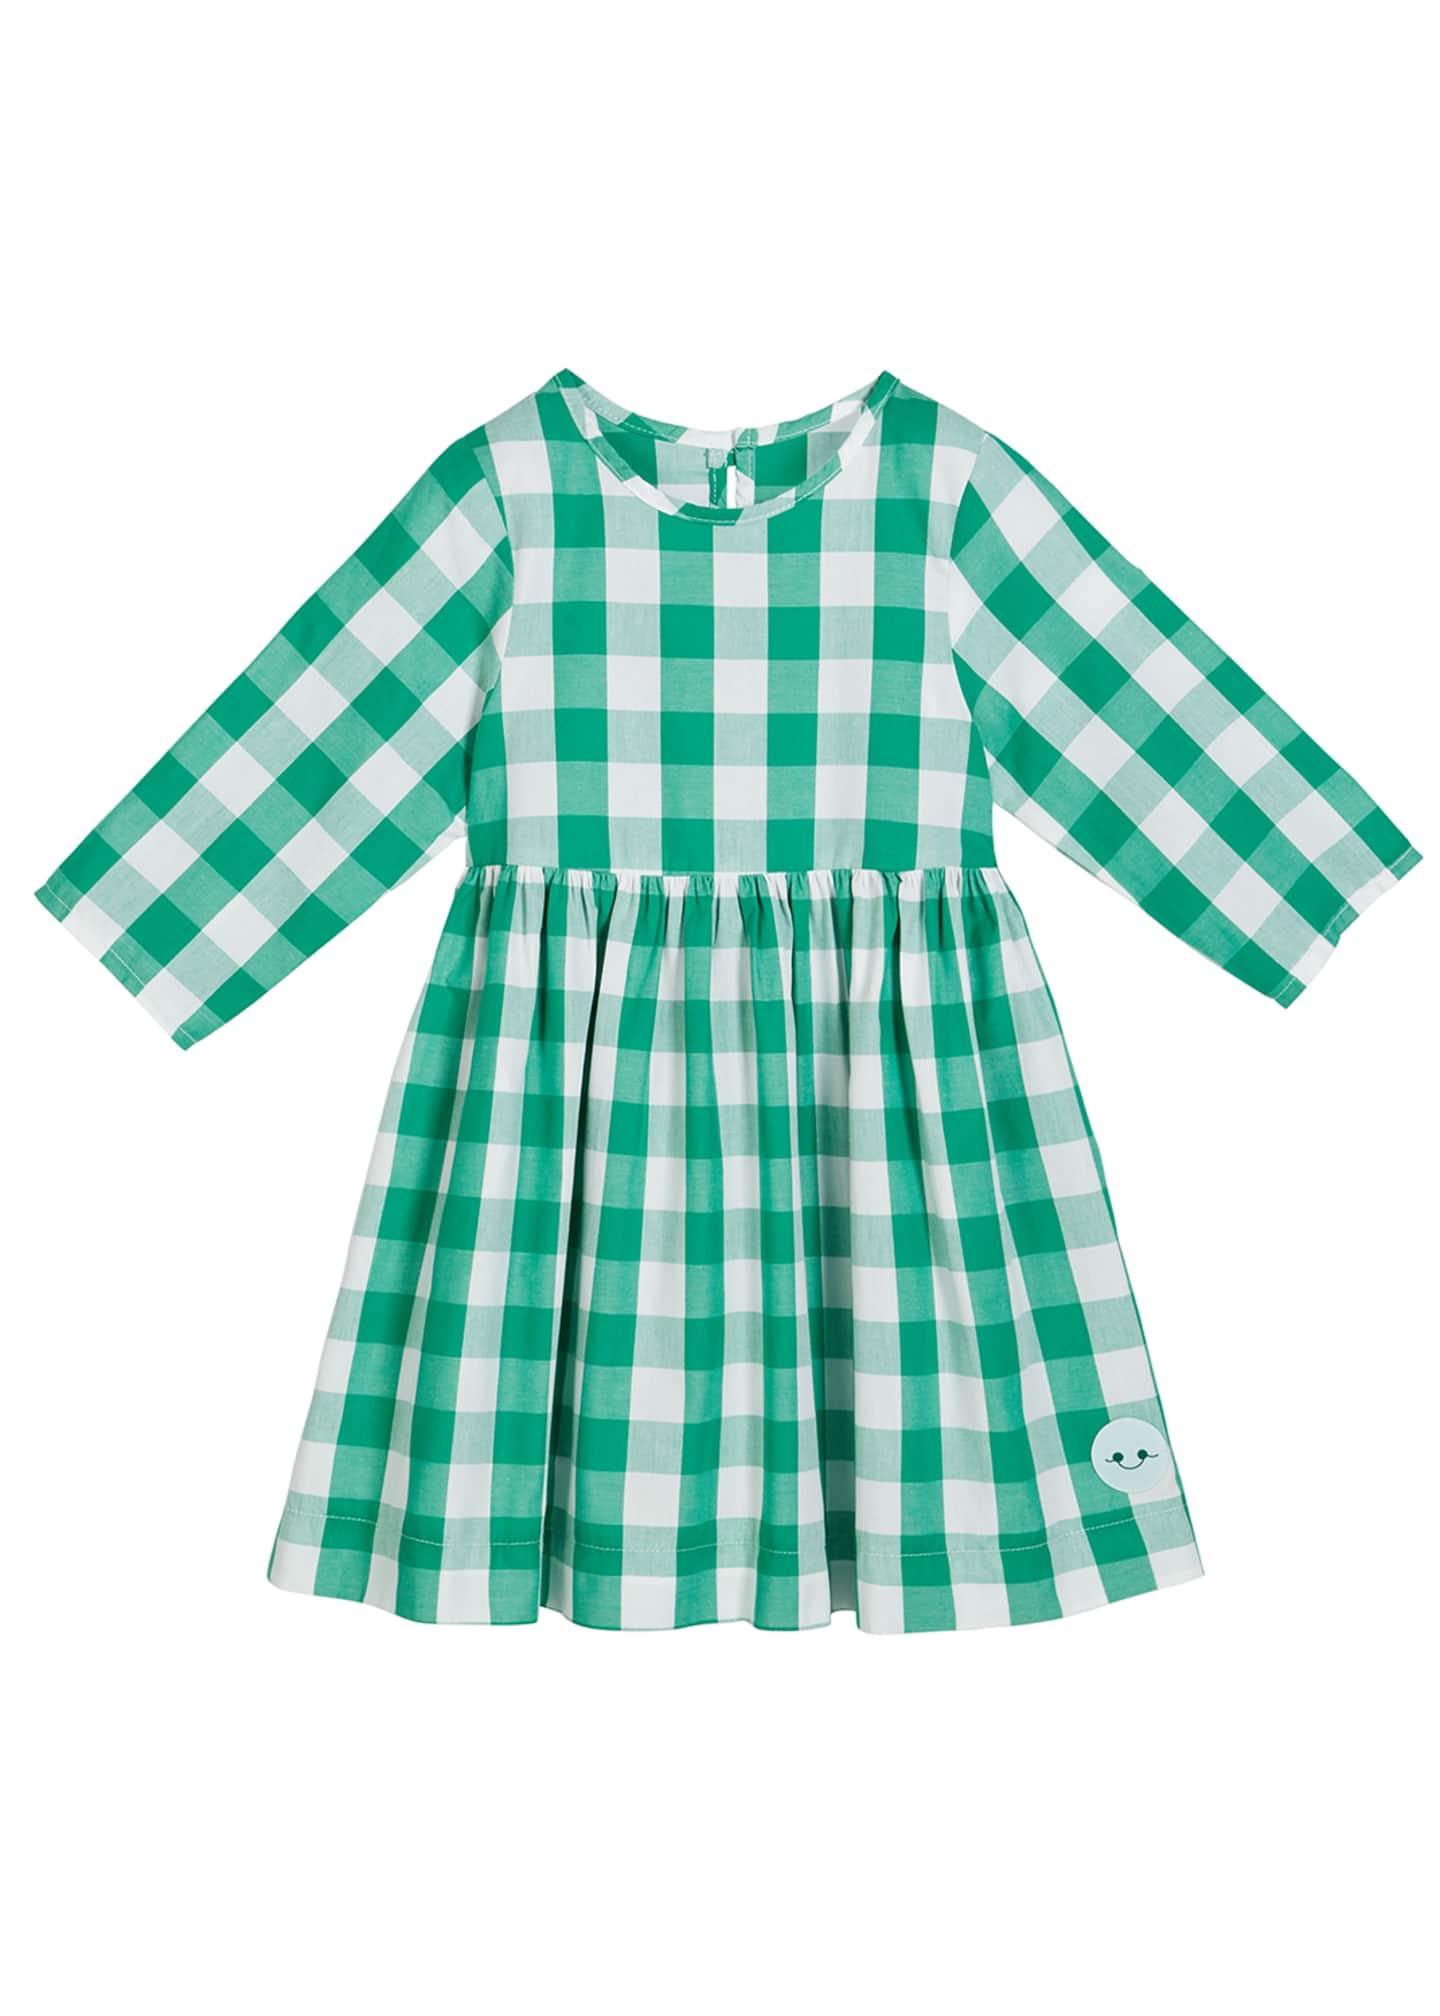 Smiling Button Buffalo Check 3/4-Sleeve Dress, Size 18m-10